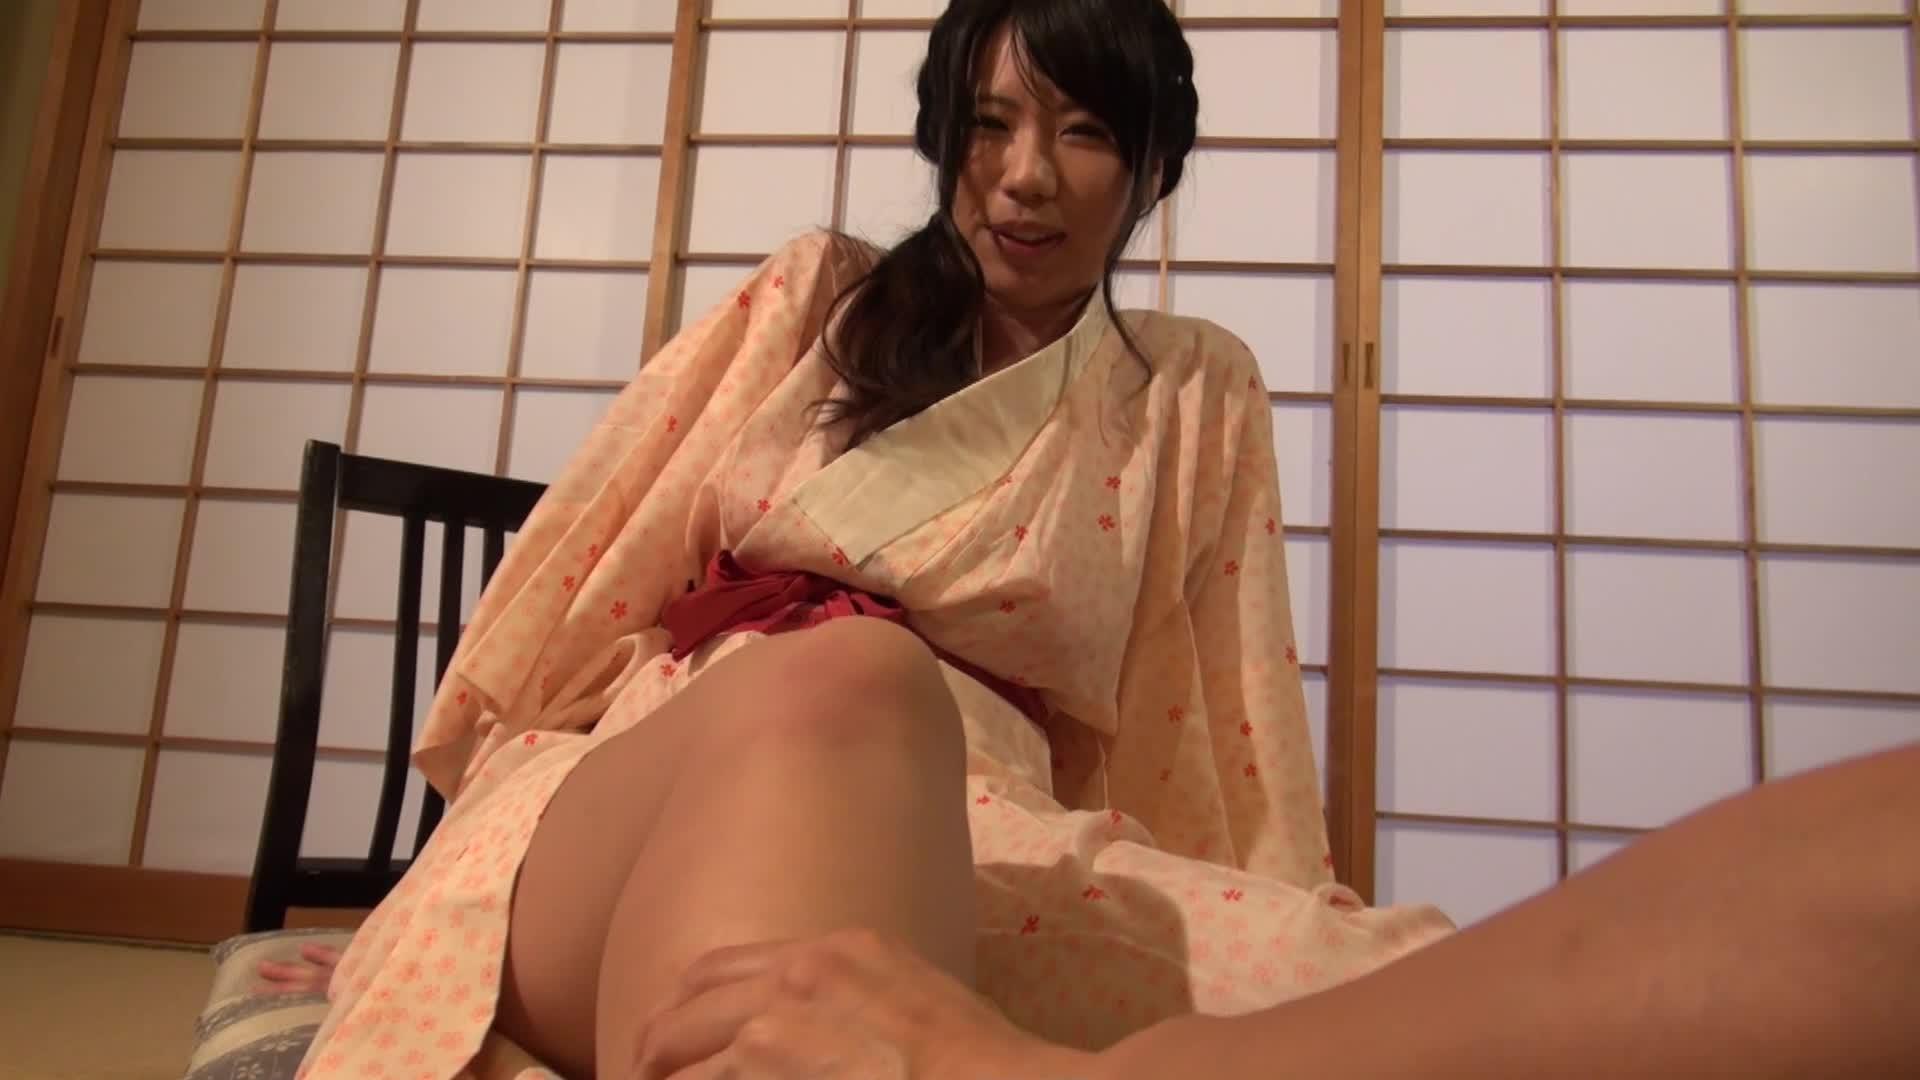 c11 - 102センチの恋旅行/桃瀬ゆき